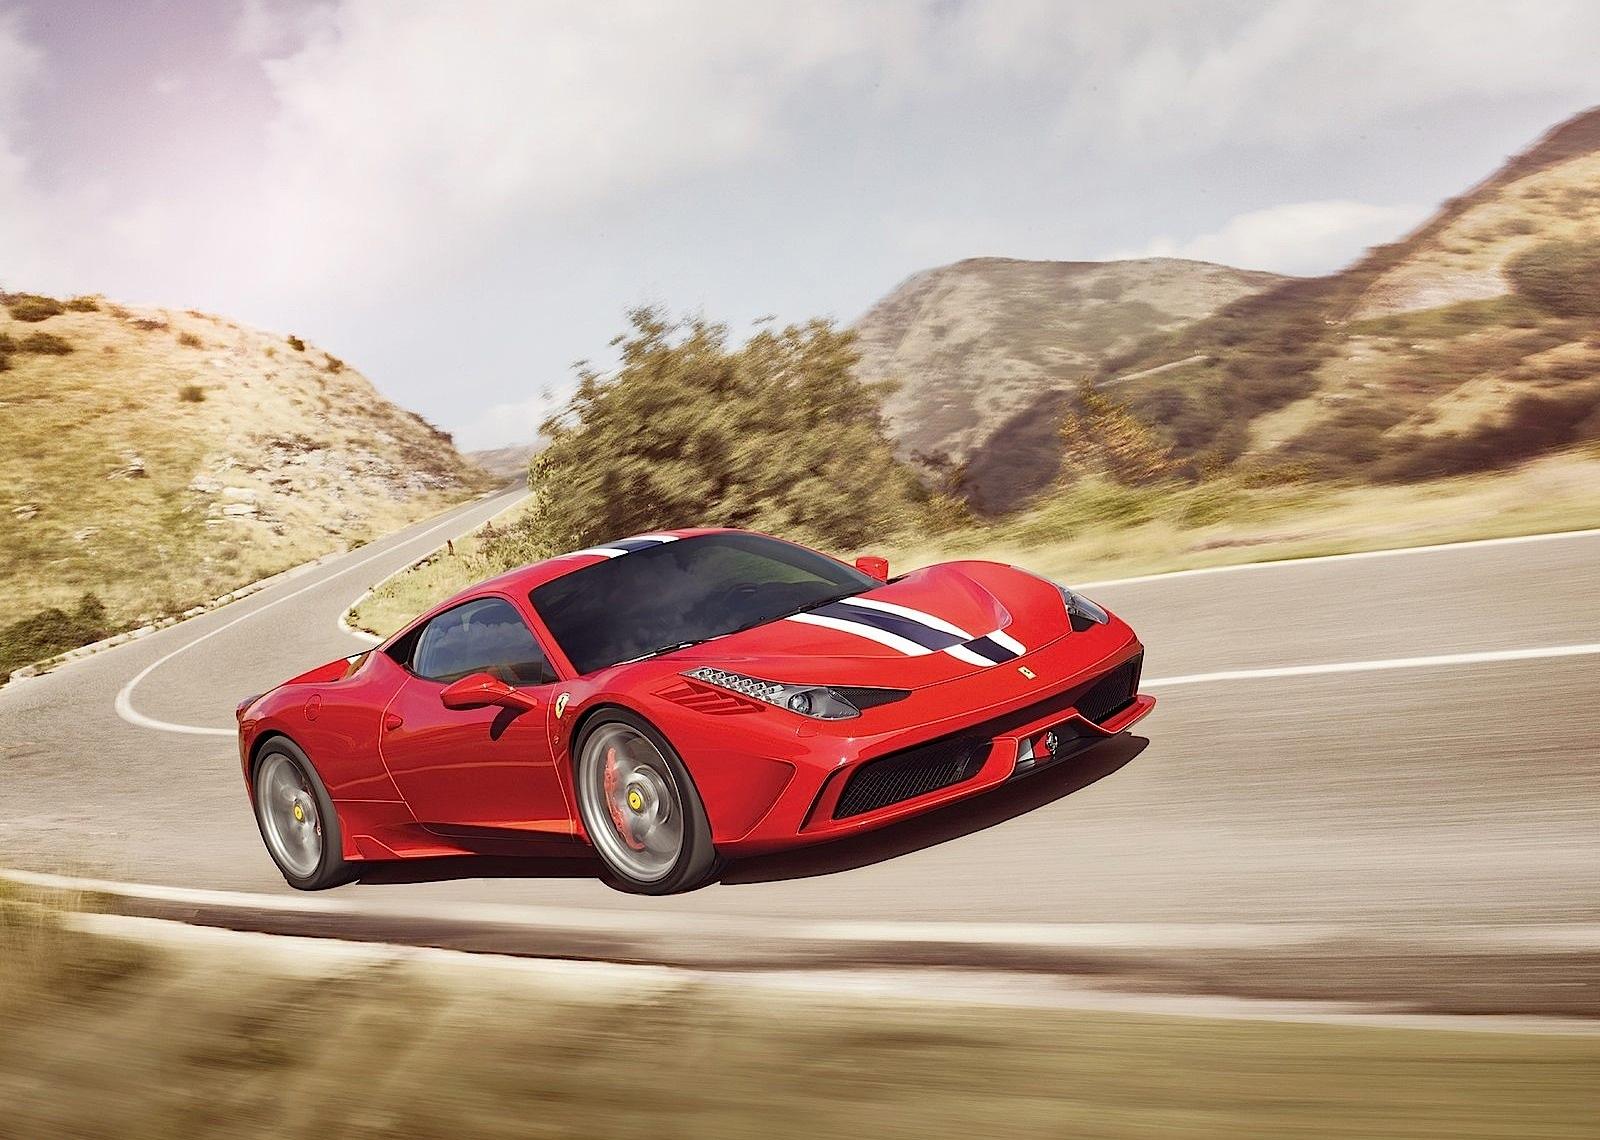 Car Wrap Images Wallpaper Ferrari 458 Speciale Specs Amp Photos 2013 2014 2015